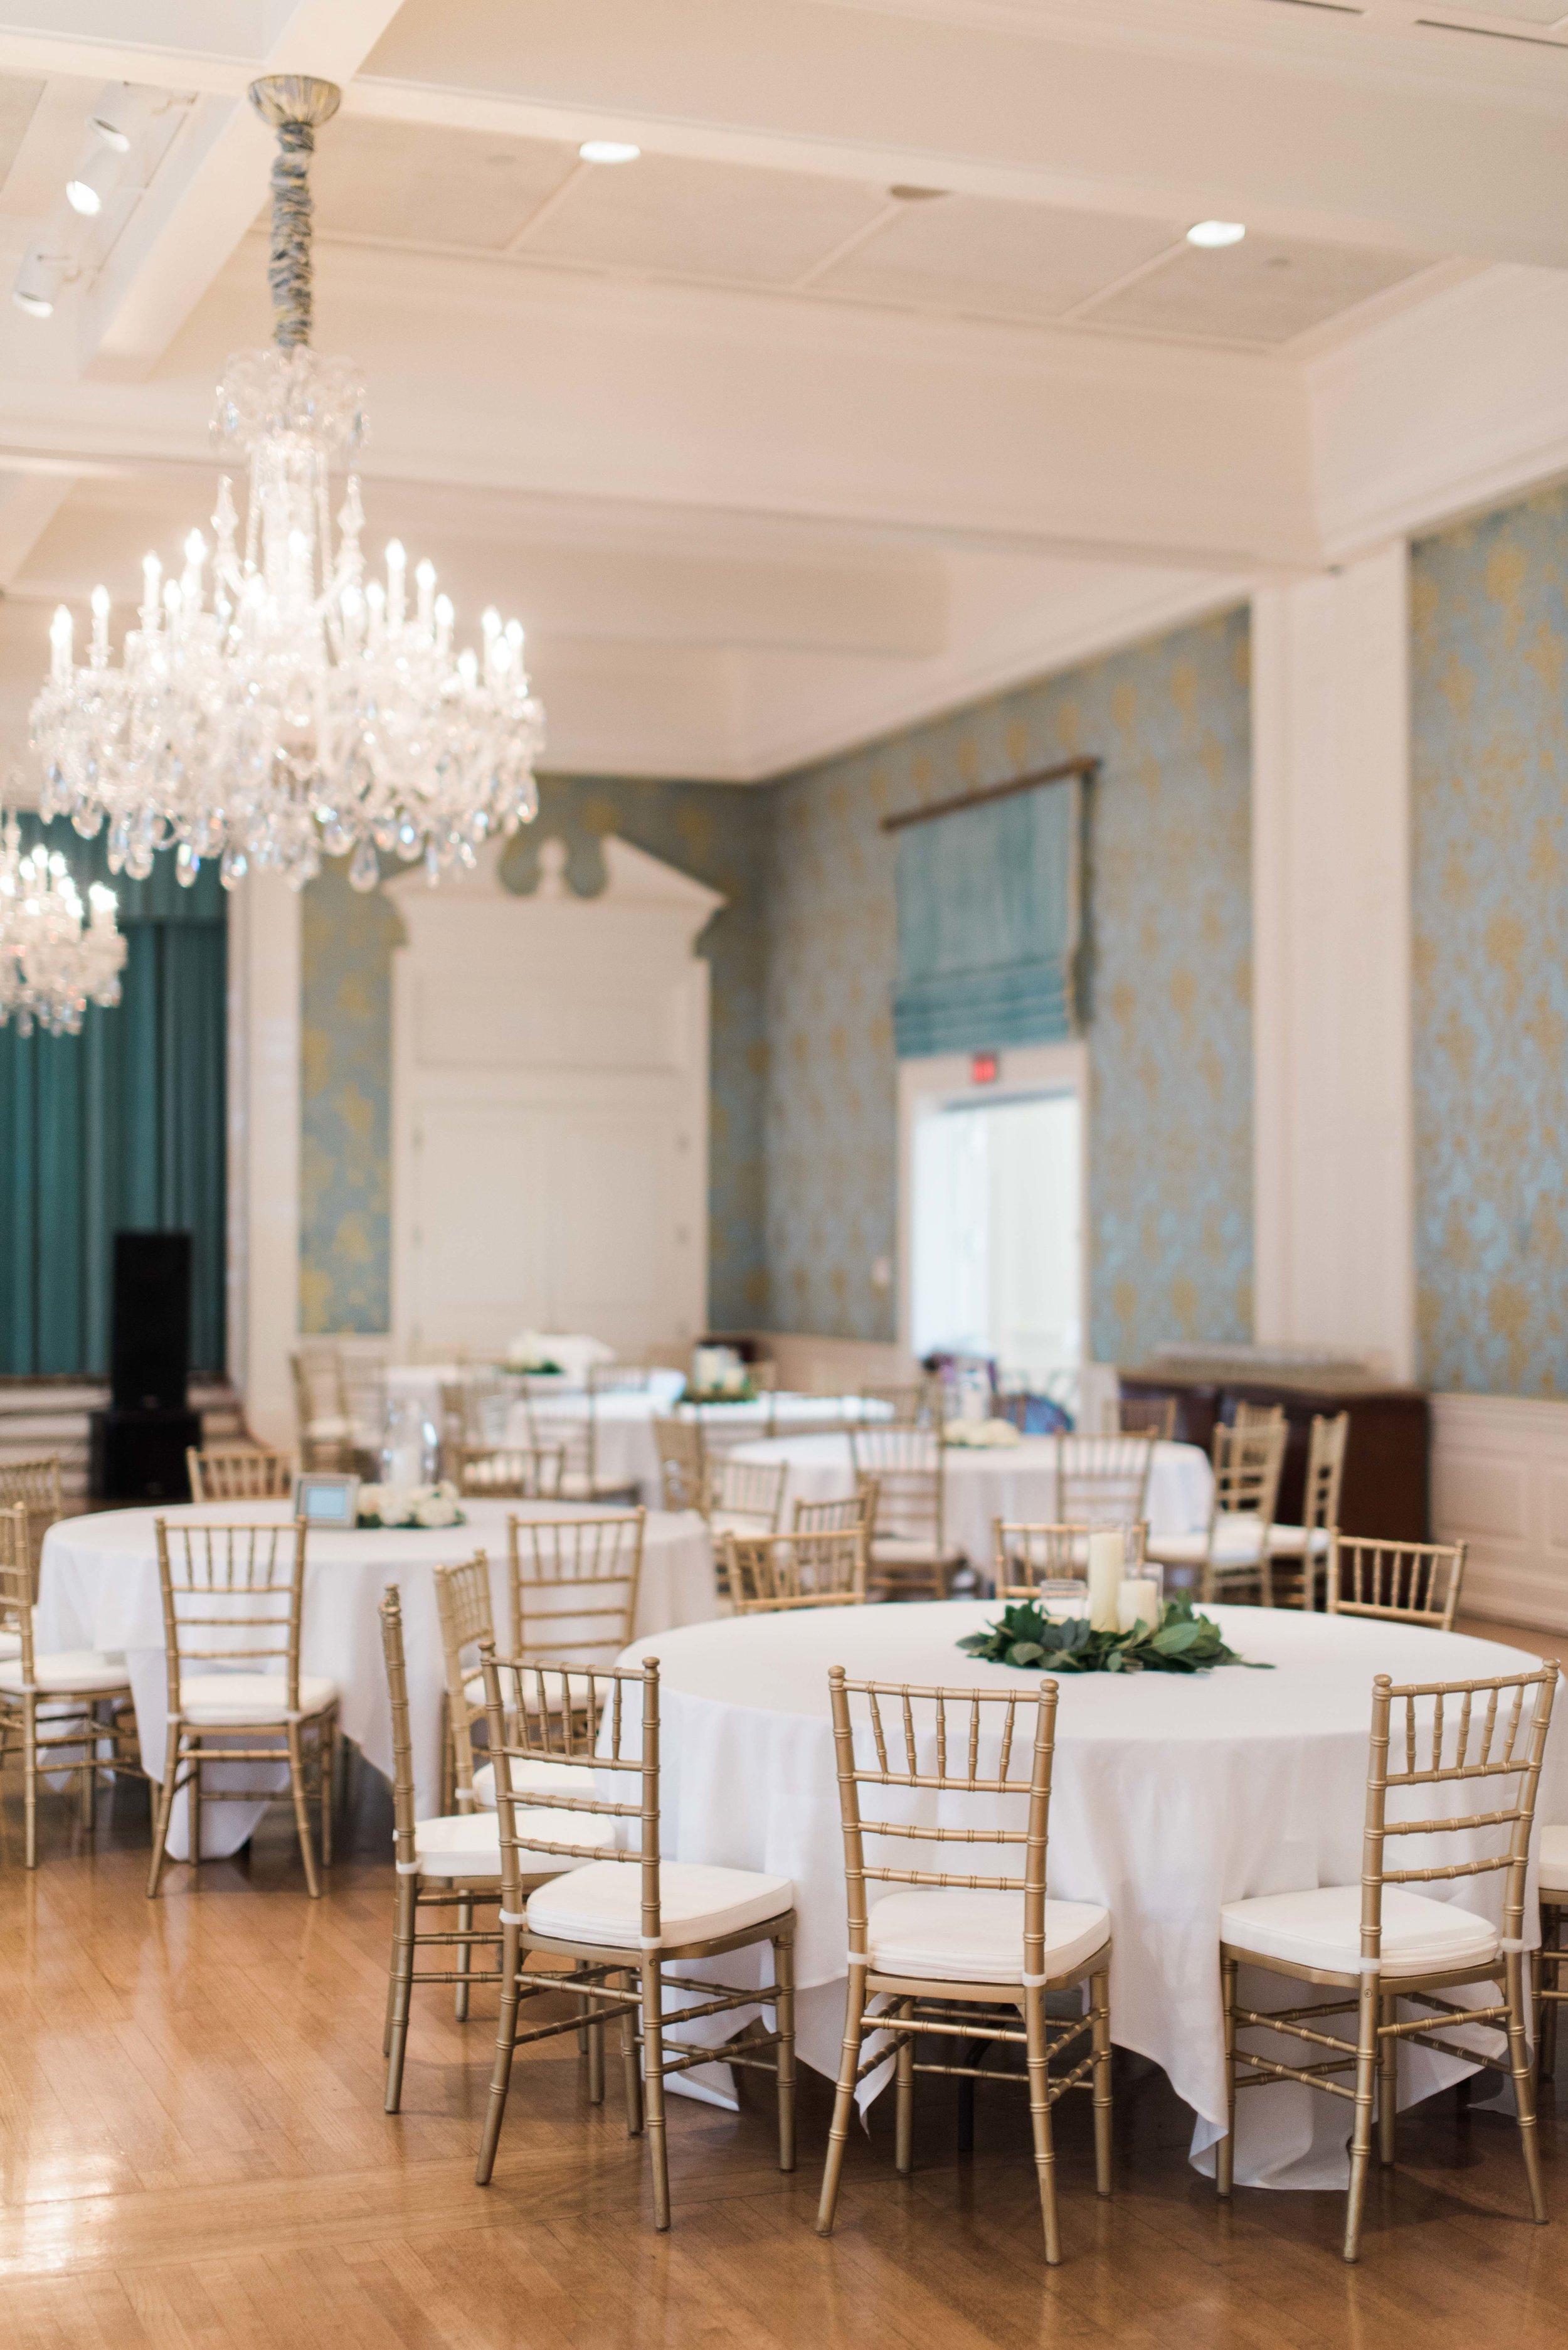 St.-Philip-Presbyterian-Church-Houston-Wedding-Ceremony-The-Junior-League-Of-Houston-Reception-Dana-Fernandez-Photography-Fine-Art-Film-27.jpg